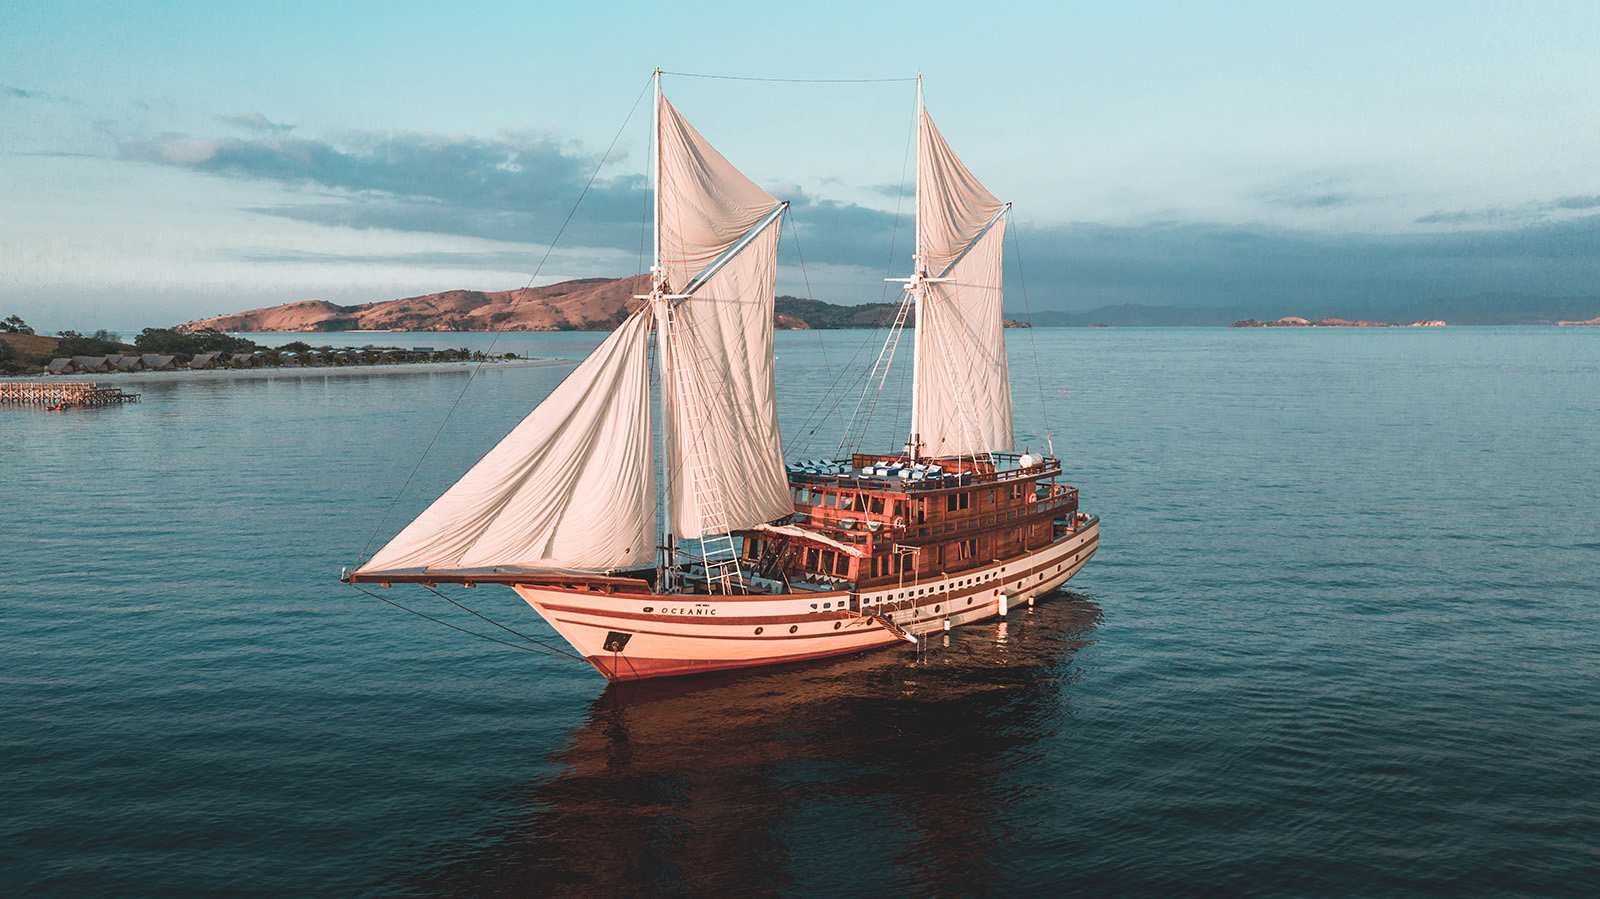 YS_Charter_Voyage_Maj_Header